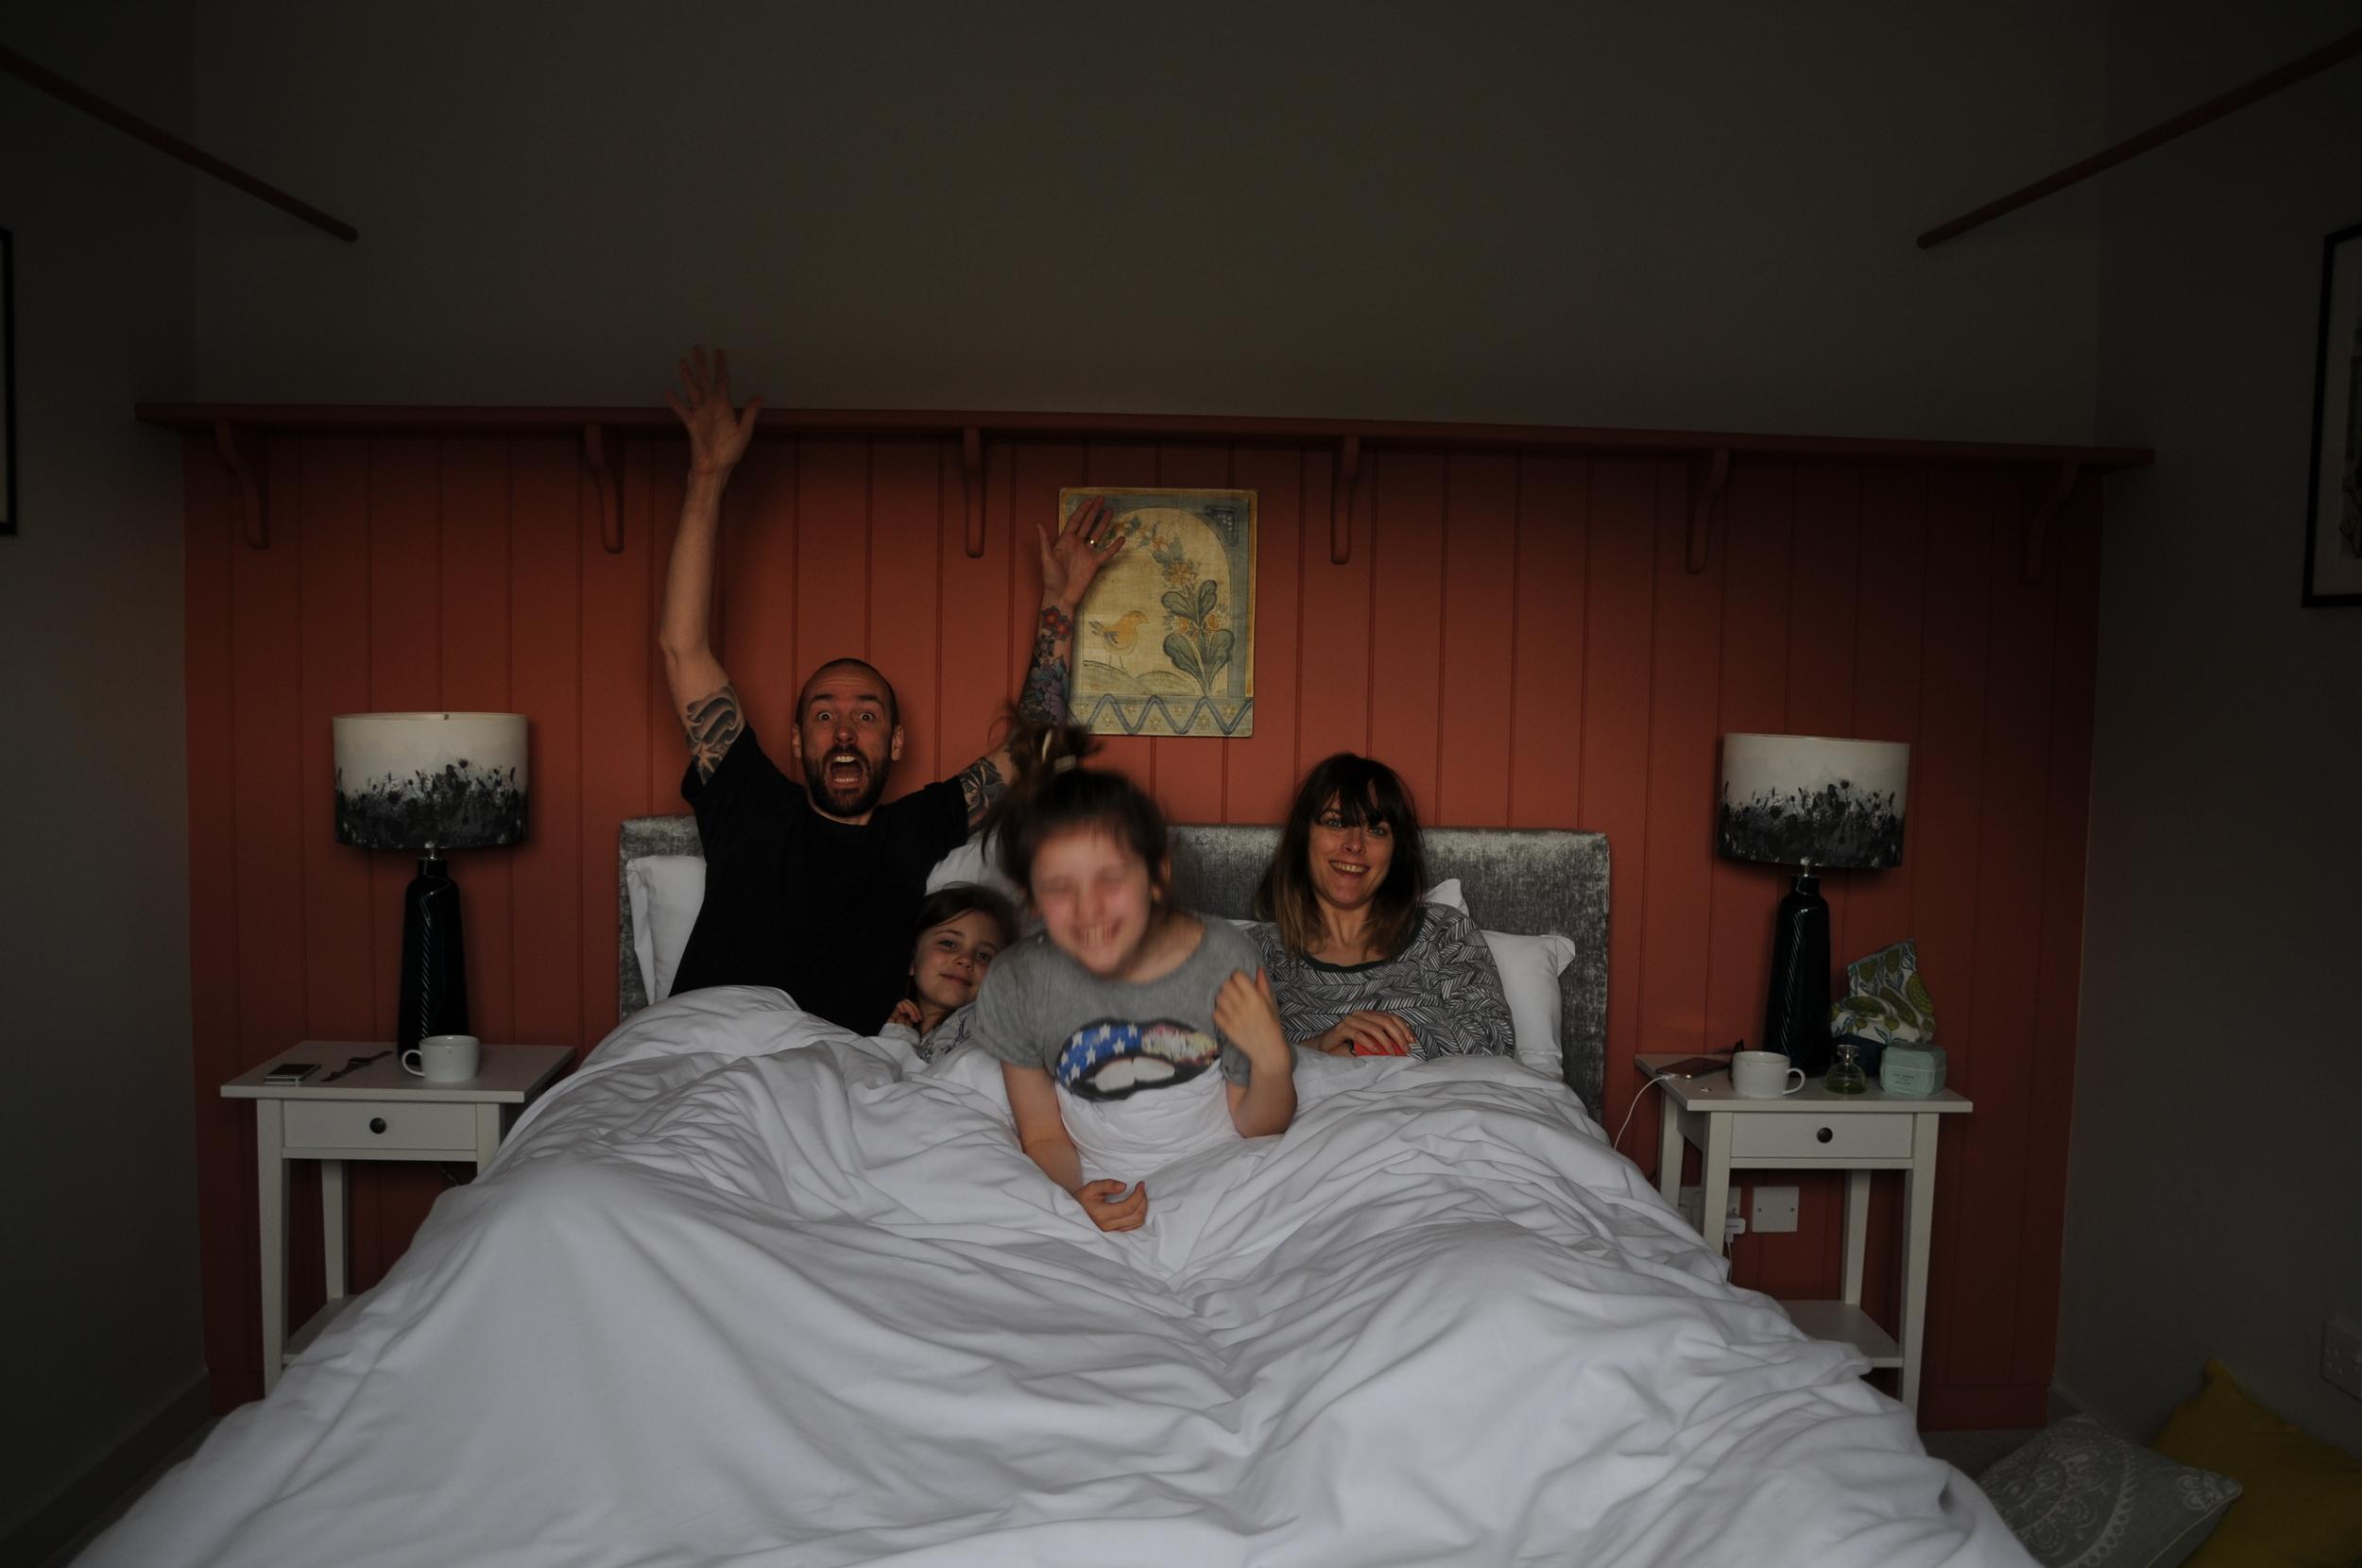 Having fun with the family at The Loose Box, Barsham Barns, Norfolk.